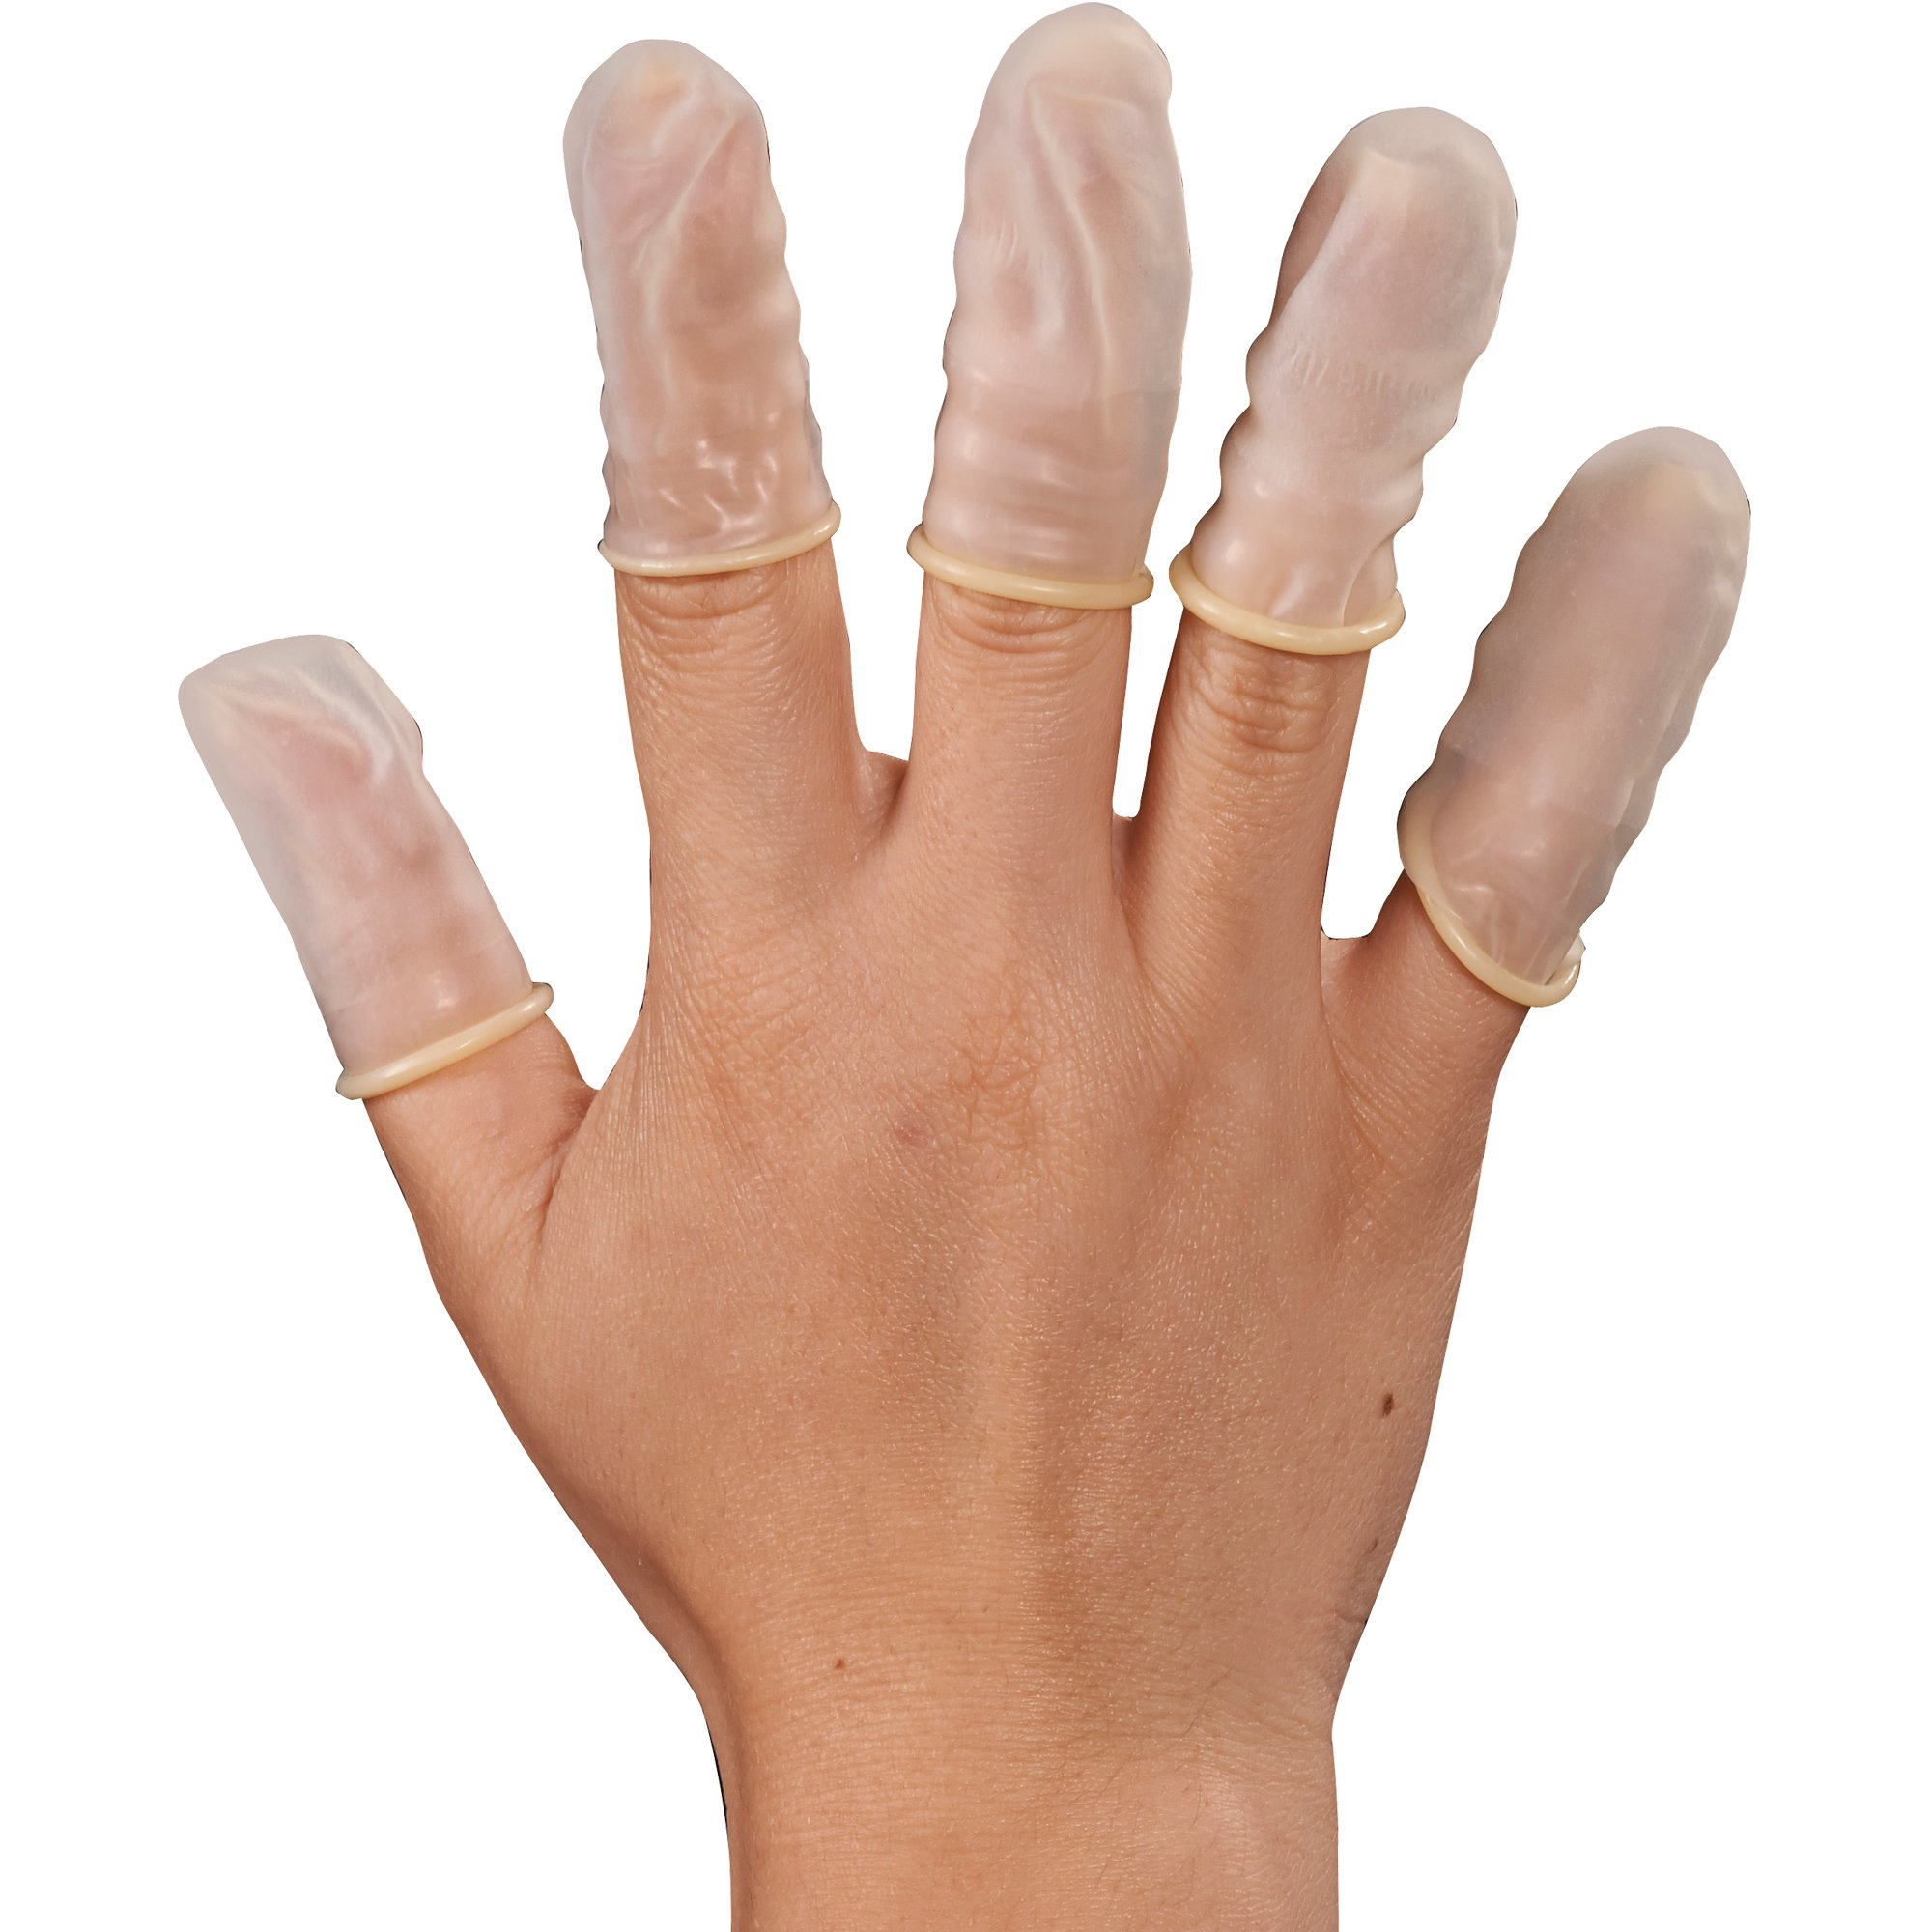 Aviditi Latex Finger Cots, Powder-Free, Medium, Case of 720 (GLV2201M) by Aviditi